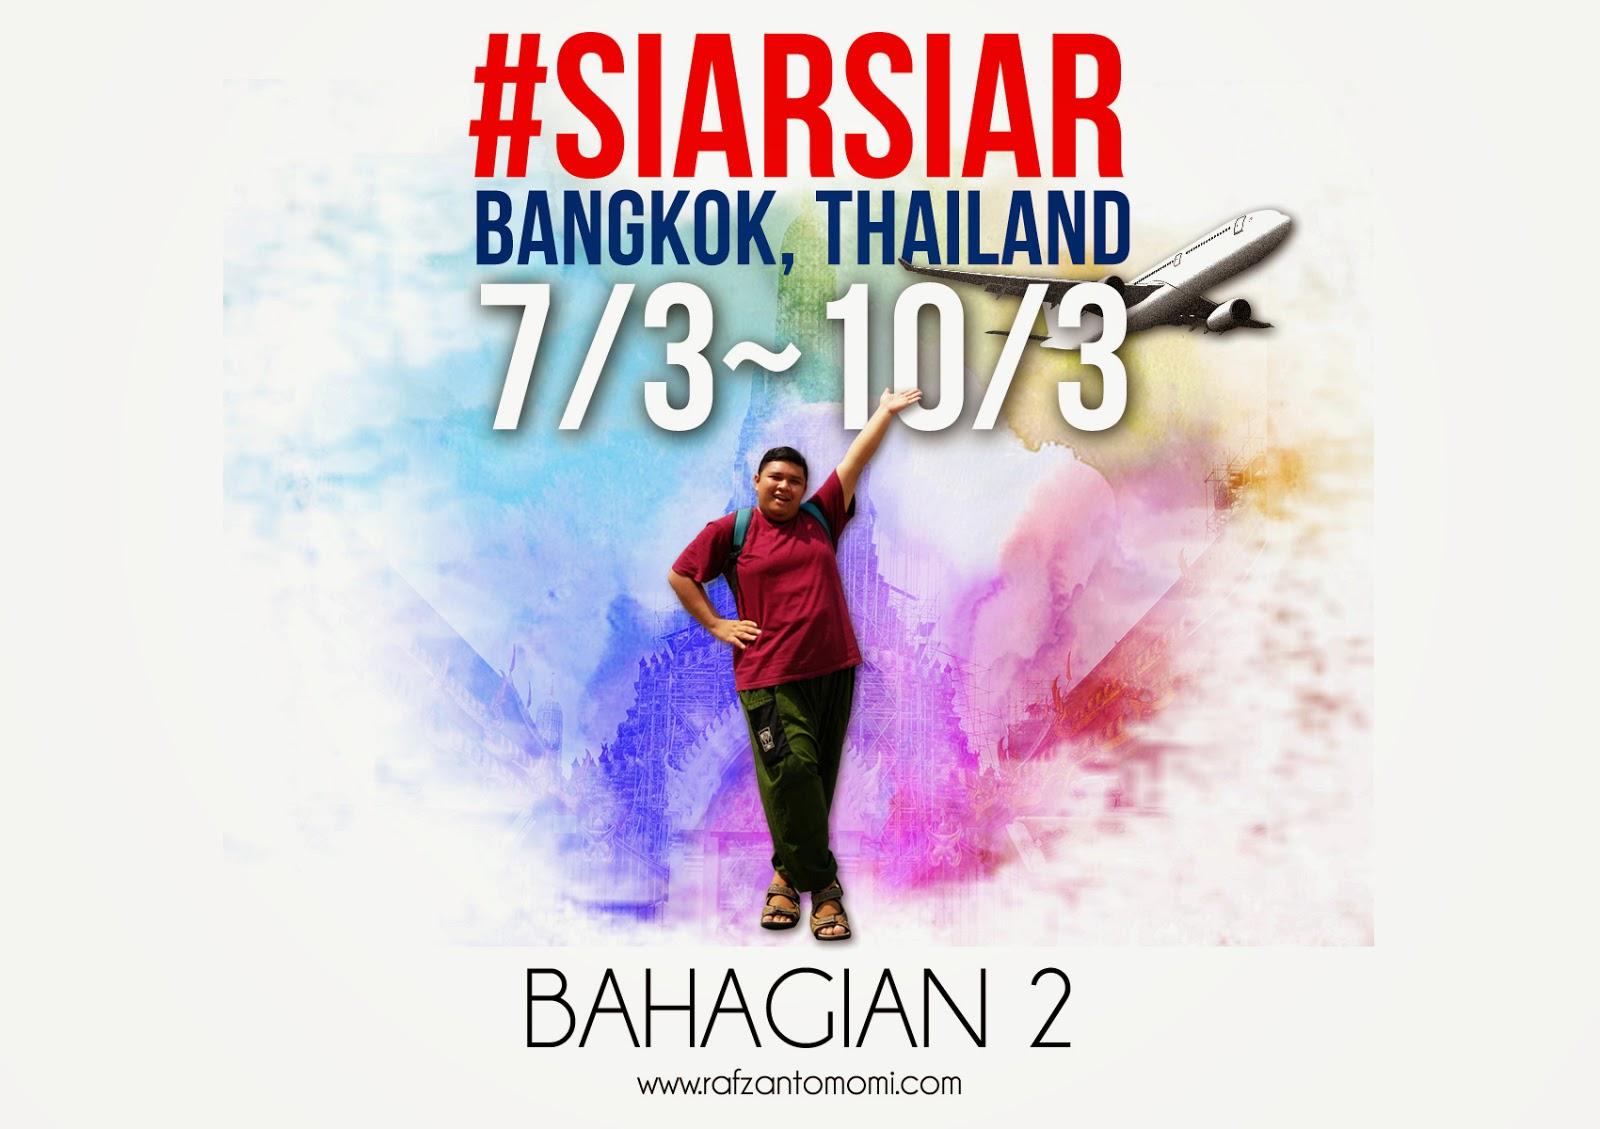 Siarsiar Bangkok Thailand 7 3 10 3 Bahagian 2 Welcome to Bangkok